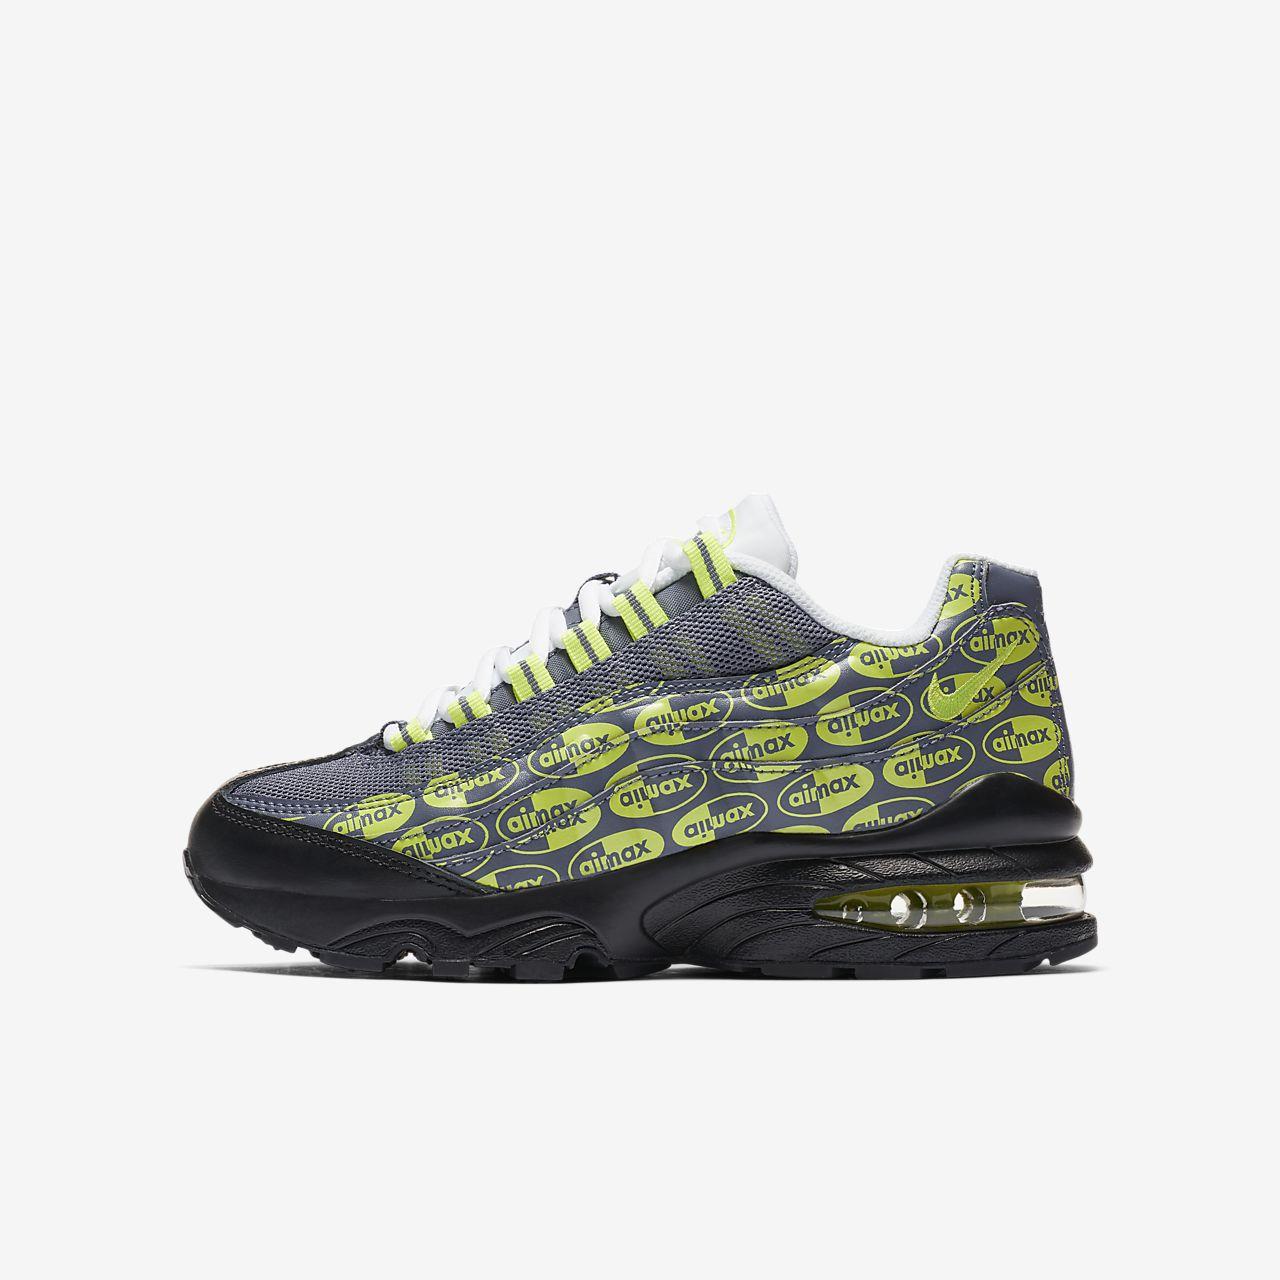 5a89df53ba ... usa nike air max 95 se older kids shoe 86cb1 977ee